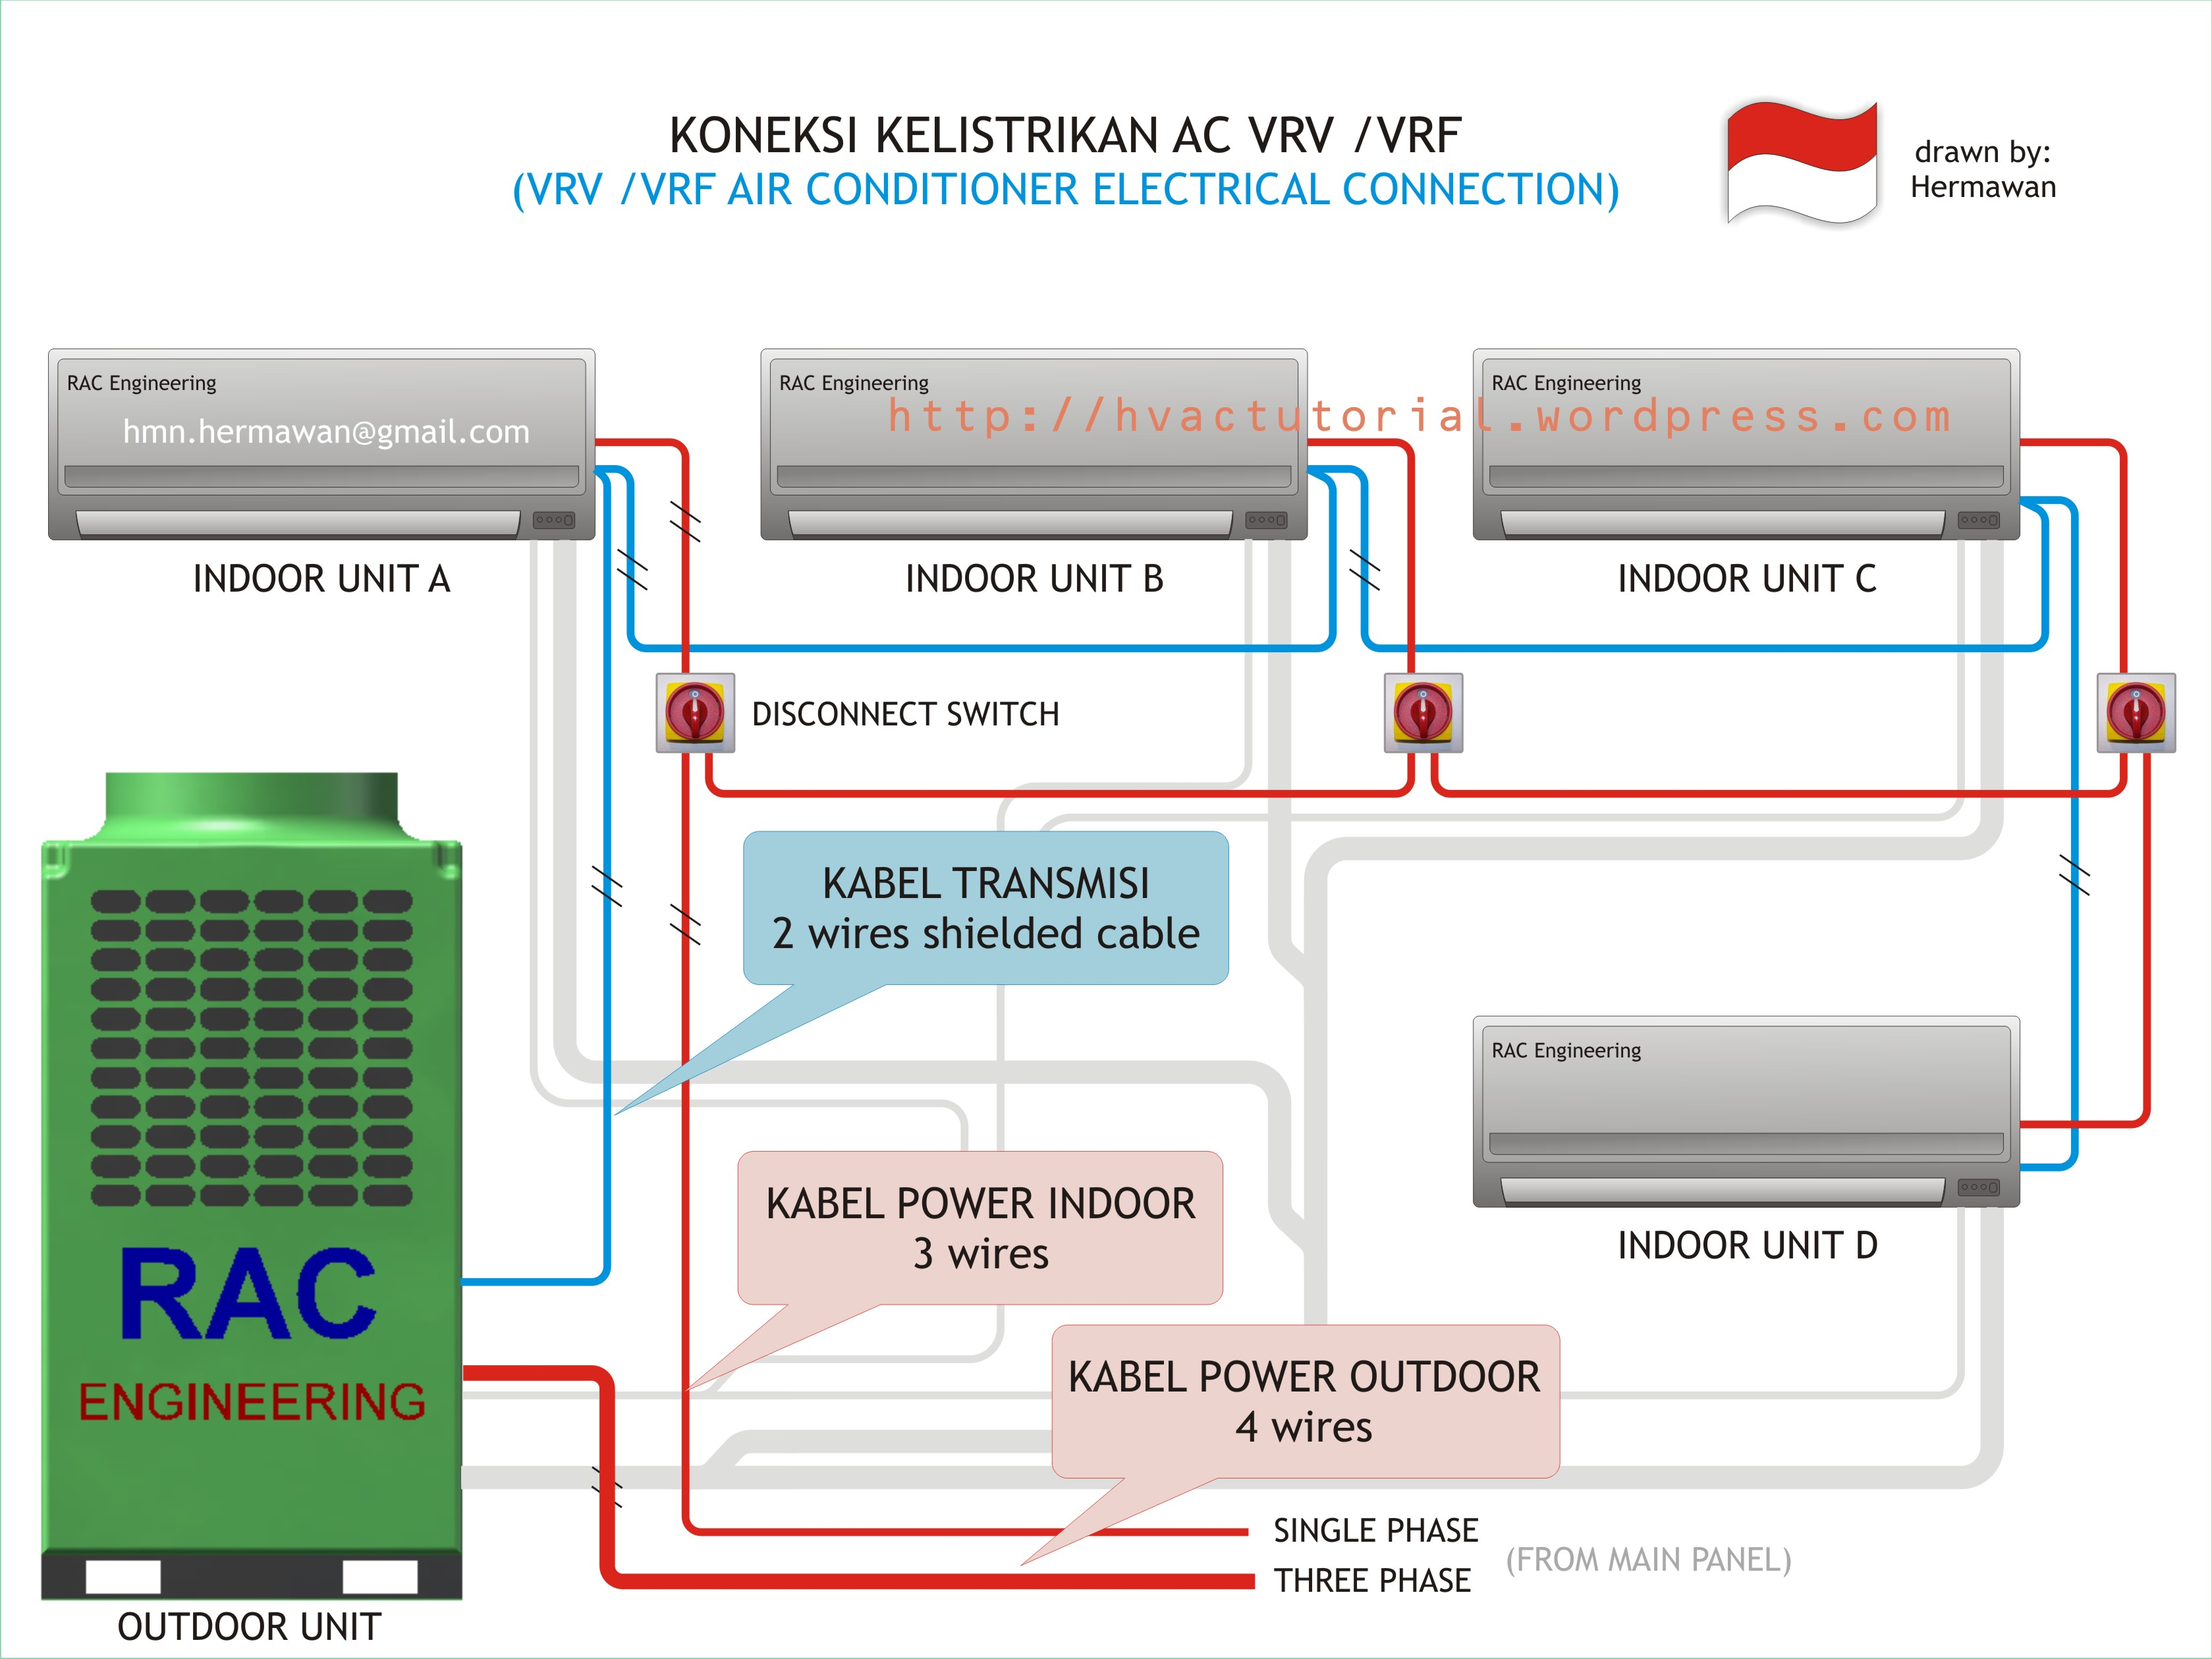 VRV Or VRF Electrical Connection